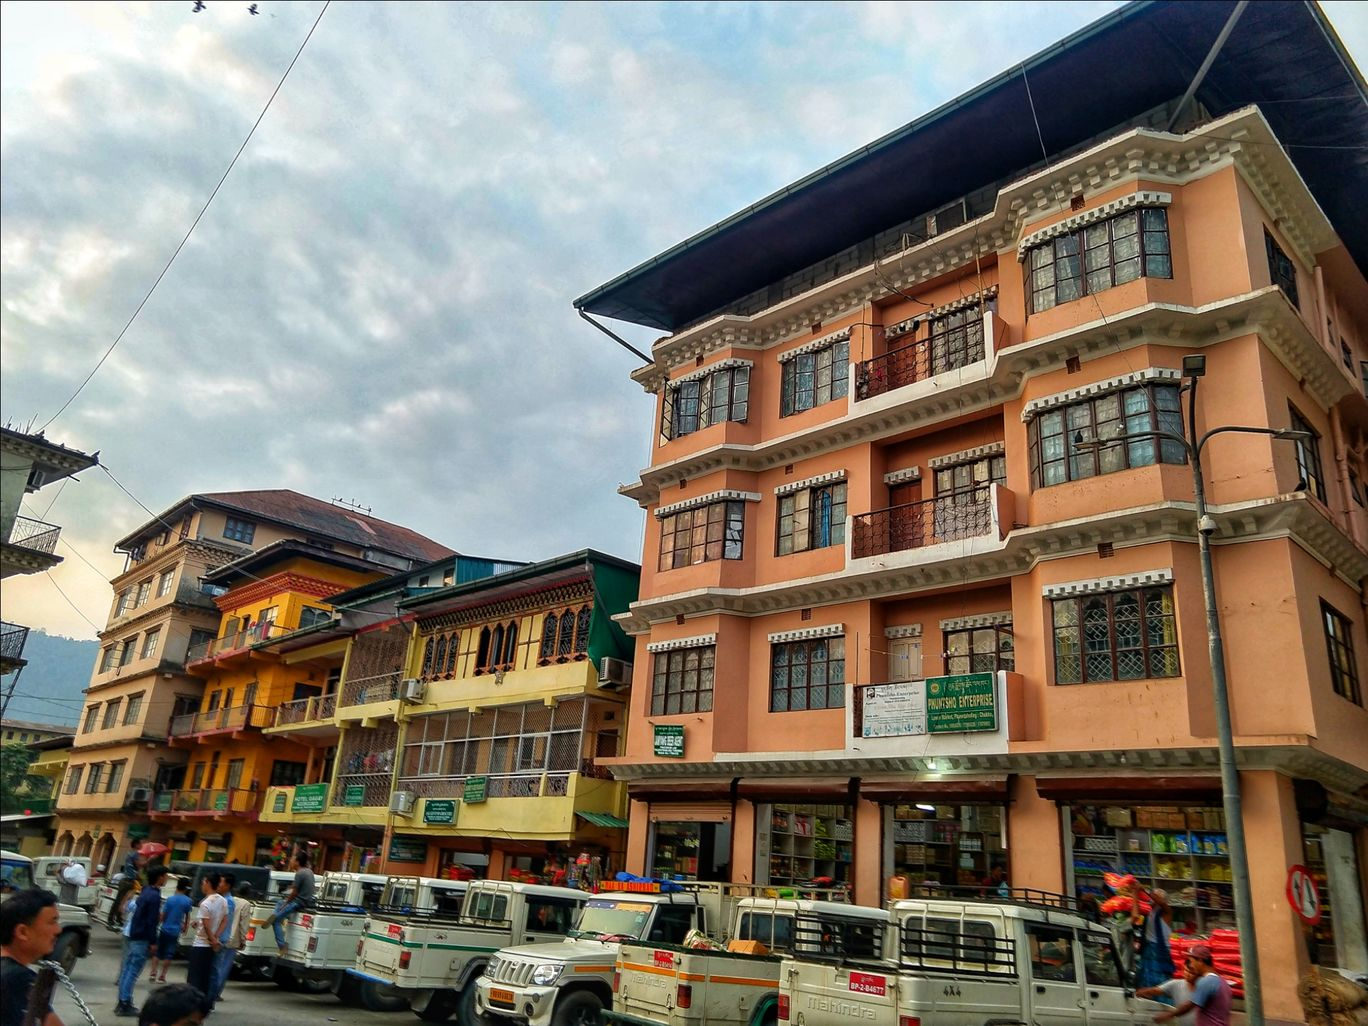 Photo of Bhutan By Dipti Pathare